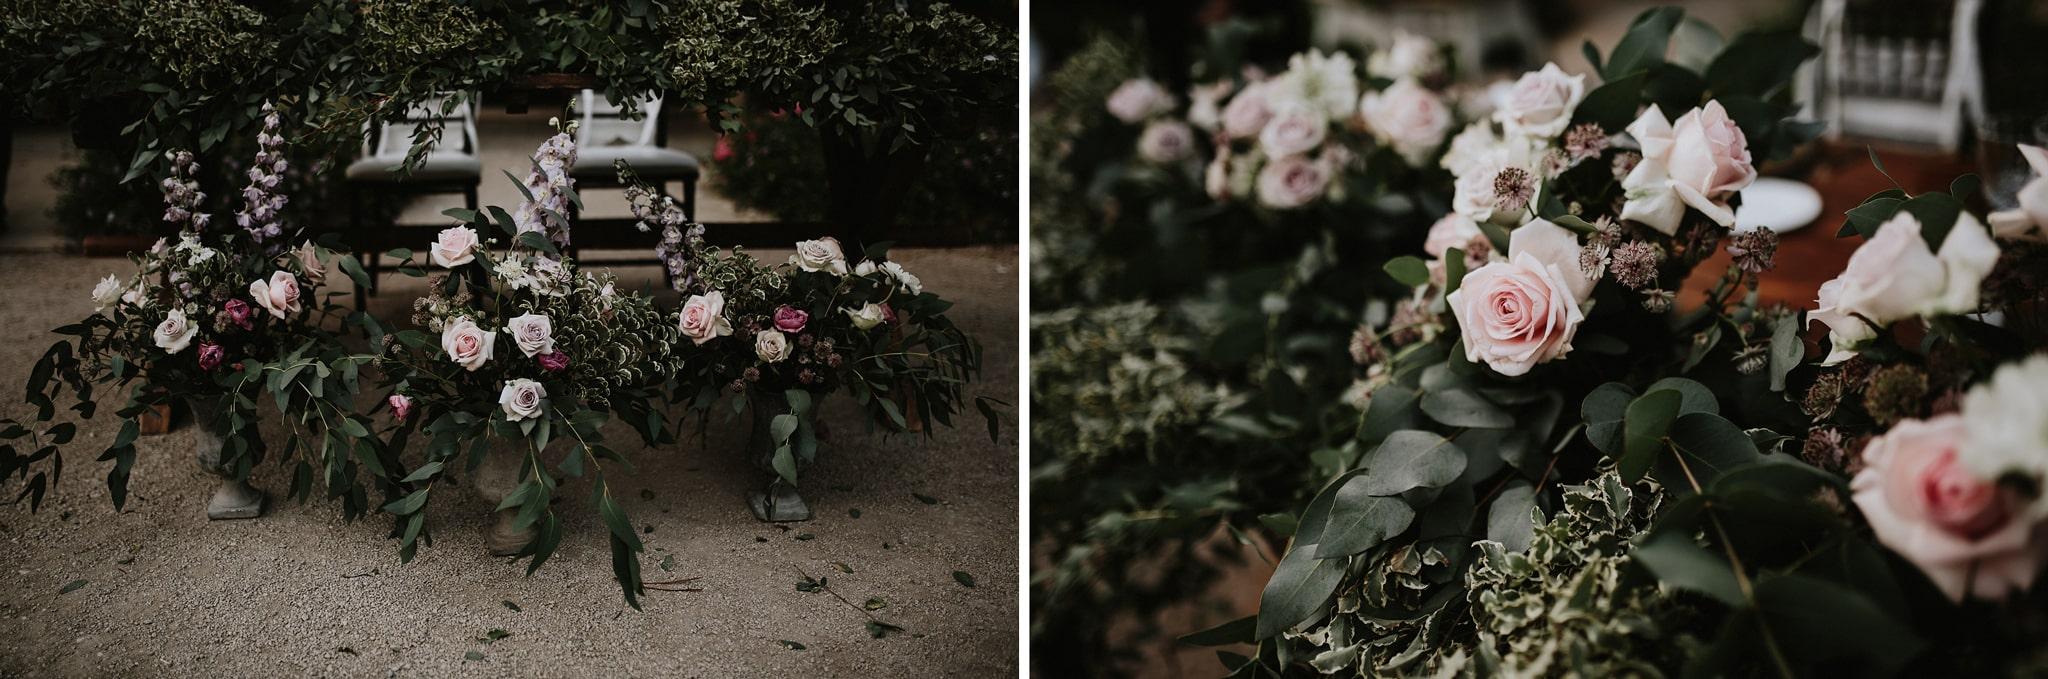 fotografo-bodas-altea-87